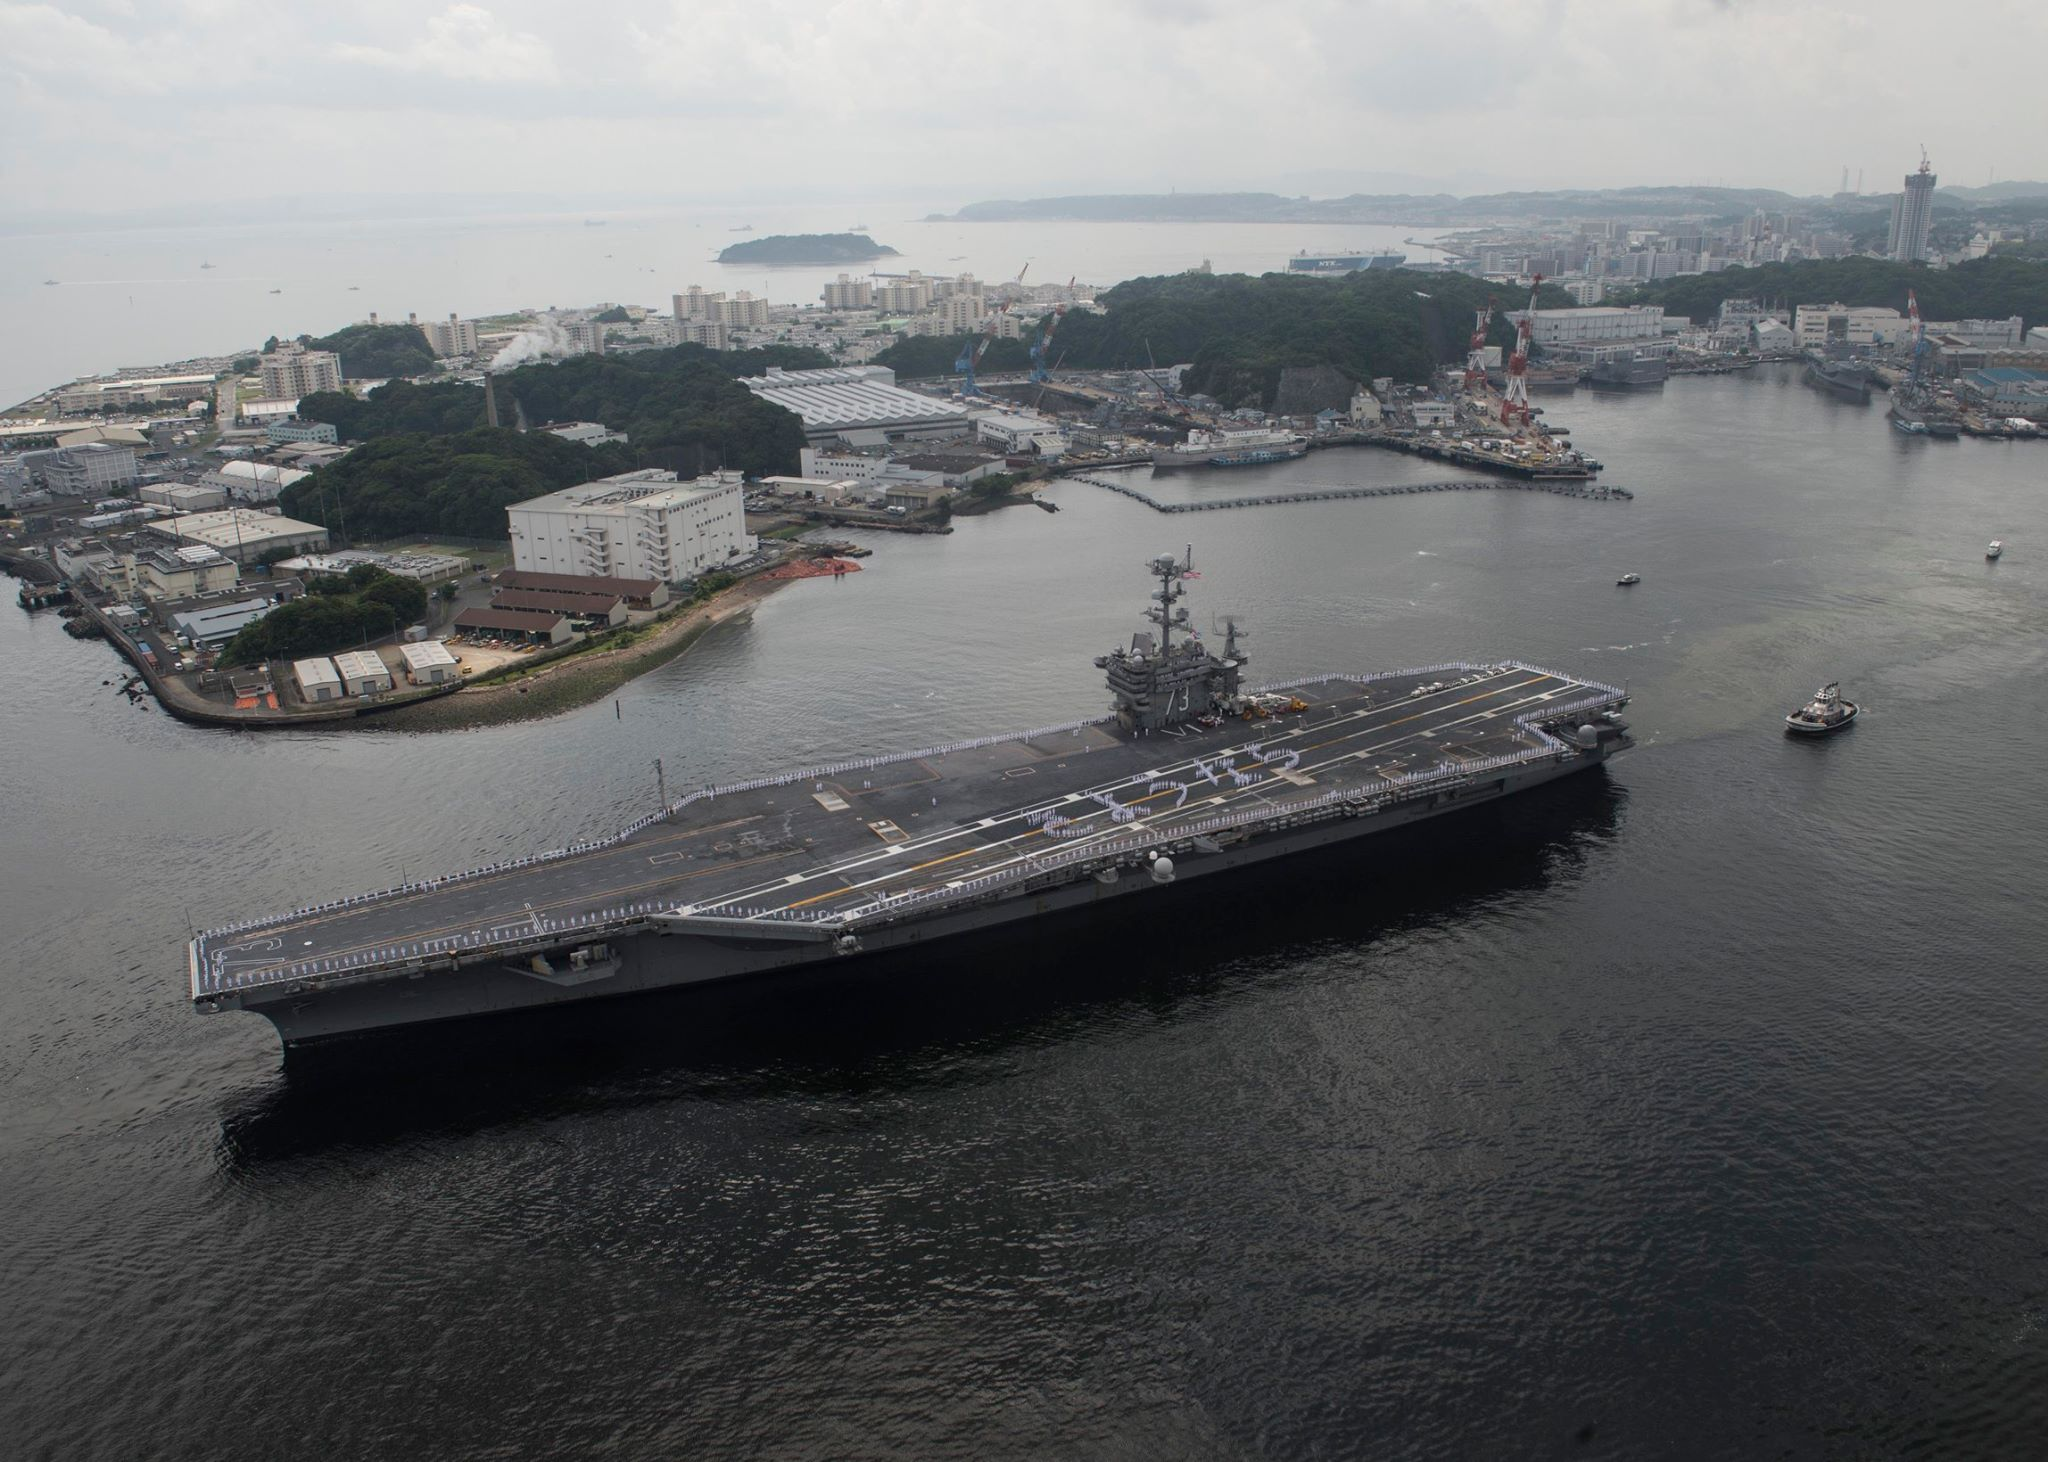 USS GEORGE WASHINGTON CVN-73 Auslaufen Yokosuka am 18.05.2015 Bild: U.S. Navy